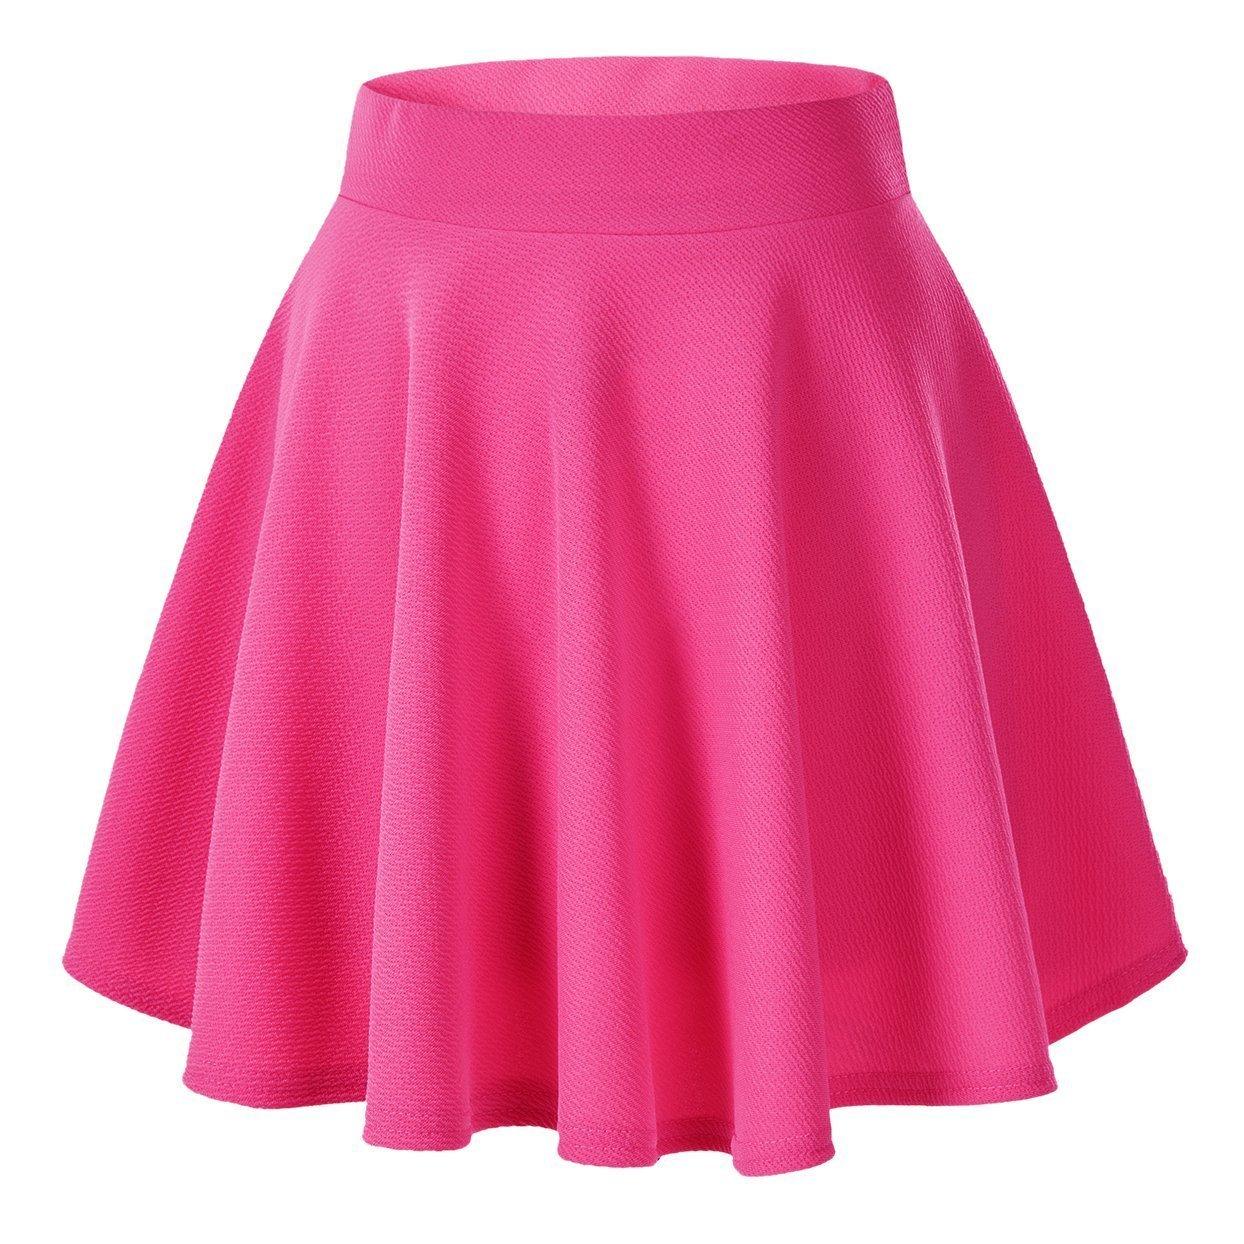 Afibi Girls Casual Mini Stretch Waist Flared Plain Pleated Skater Dress (Coral)